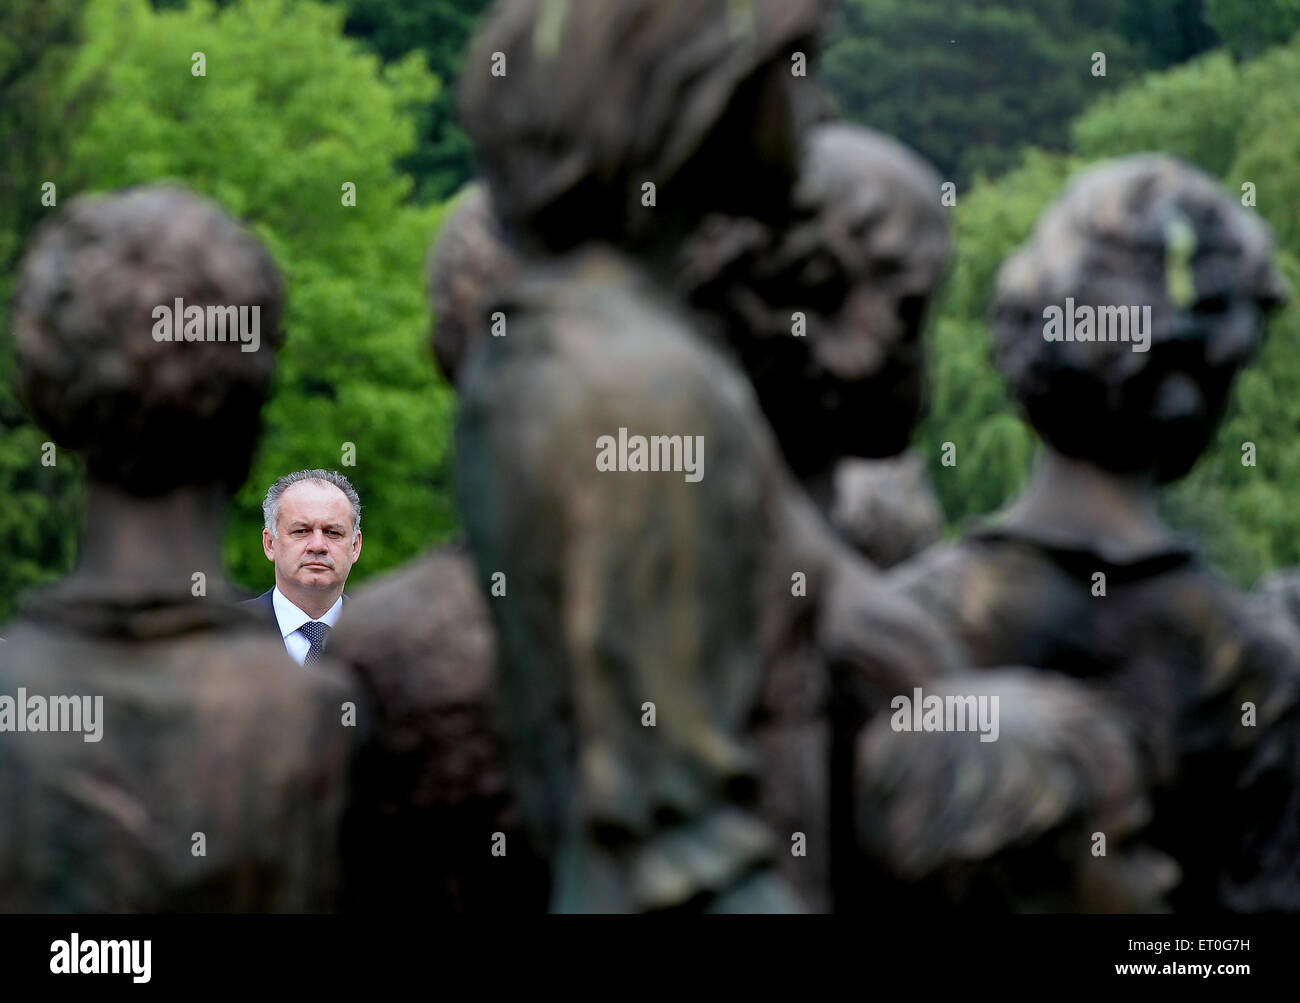 Slovak President Andrej Kiska visits the Czech Republic Lidice village paid tribute victims of Nazis, in Lidice, Stock Photo